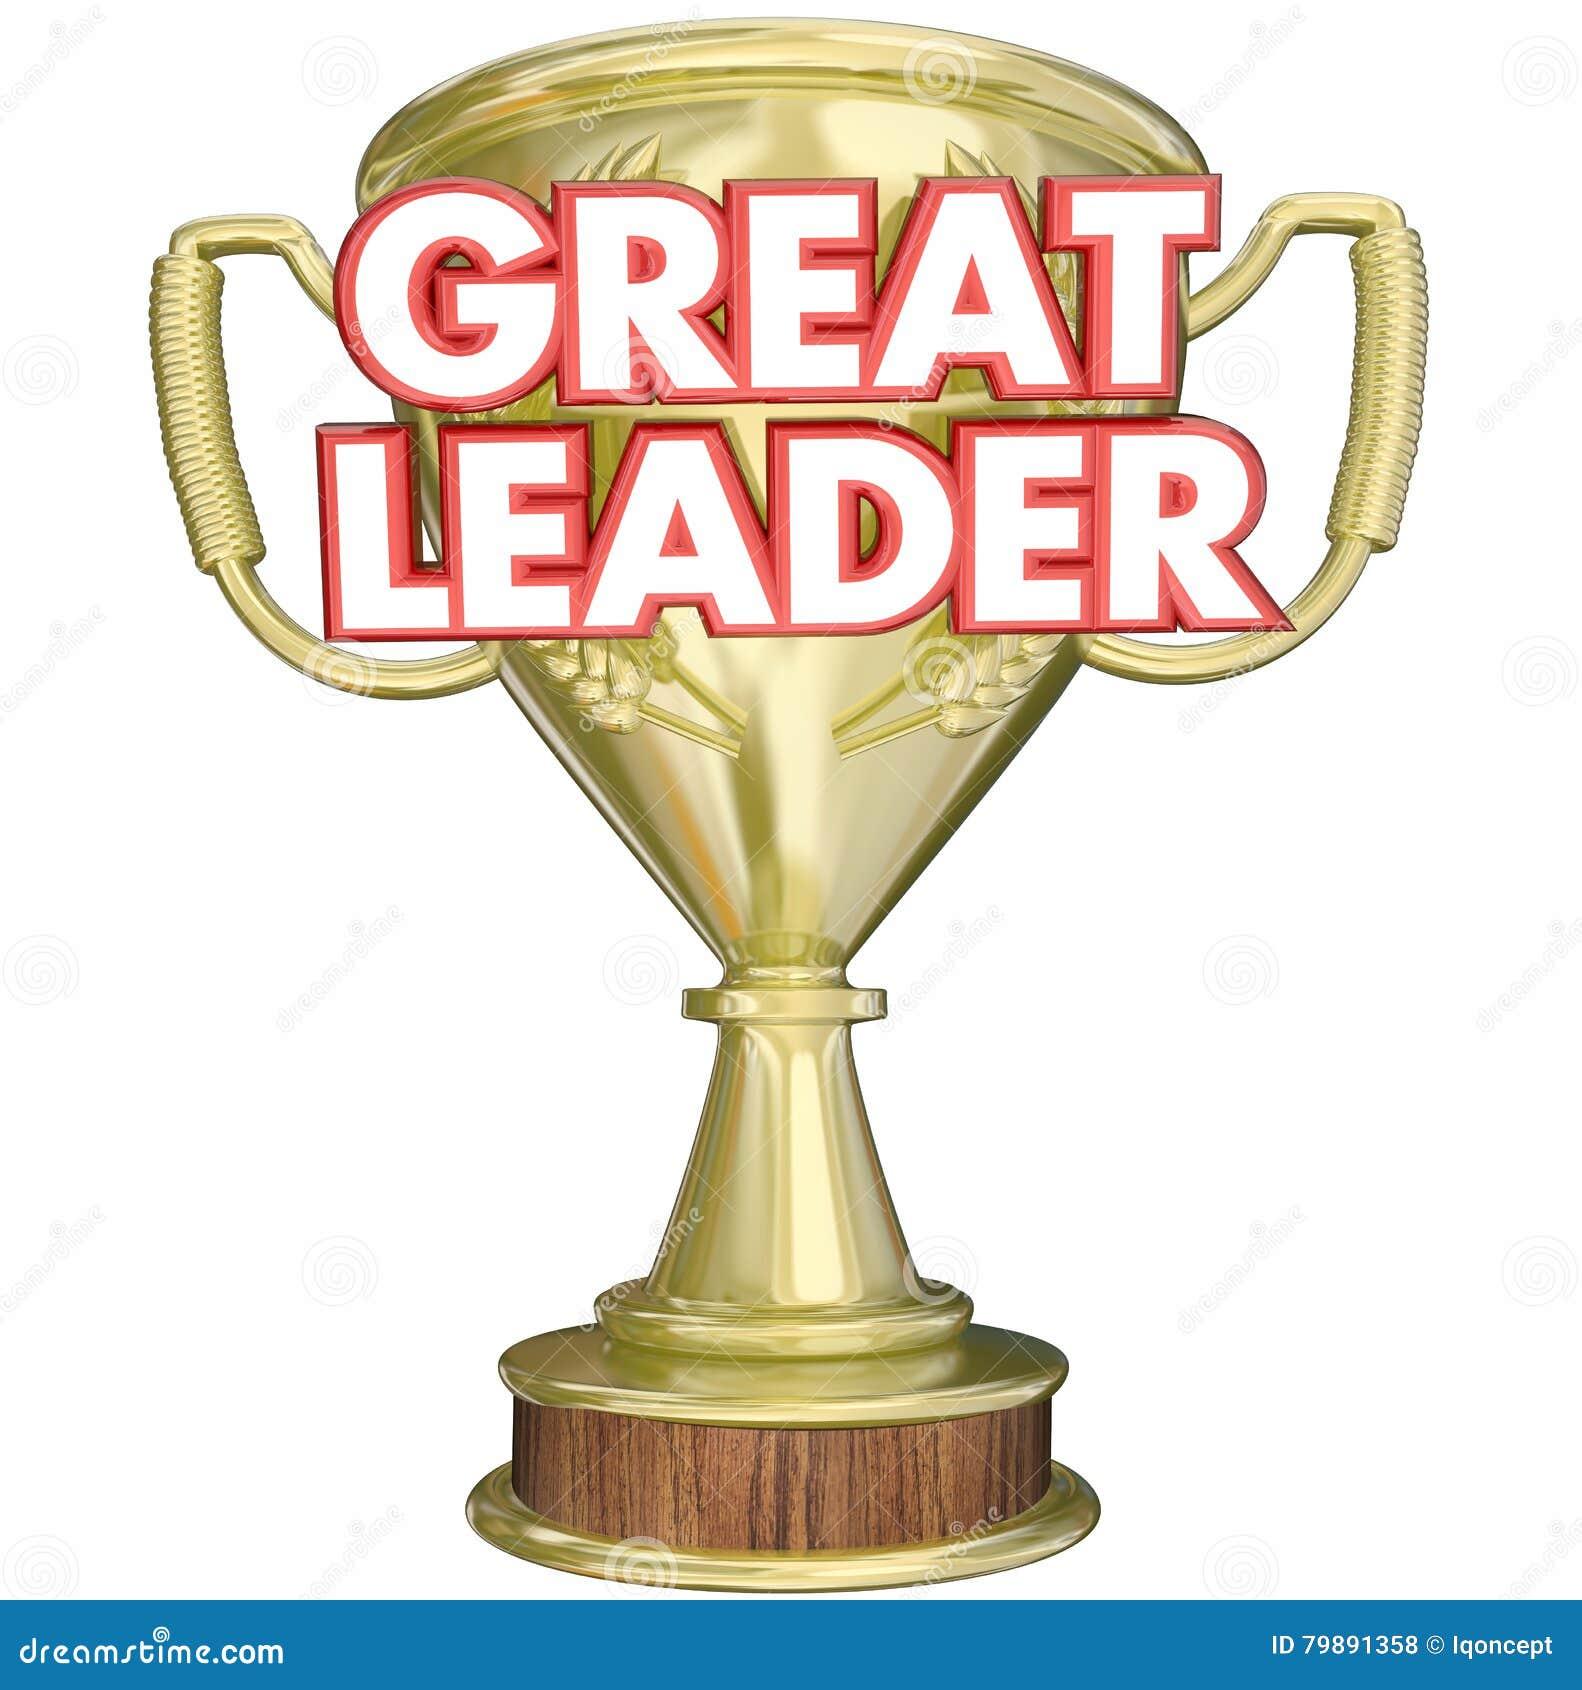 Amazing Leadership: Superviser Cartoons, Illustrations & Vector Stock Images